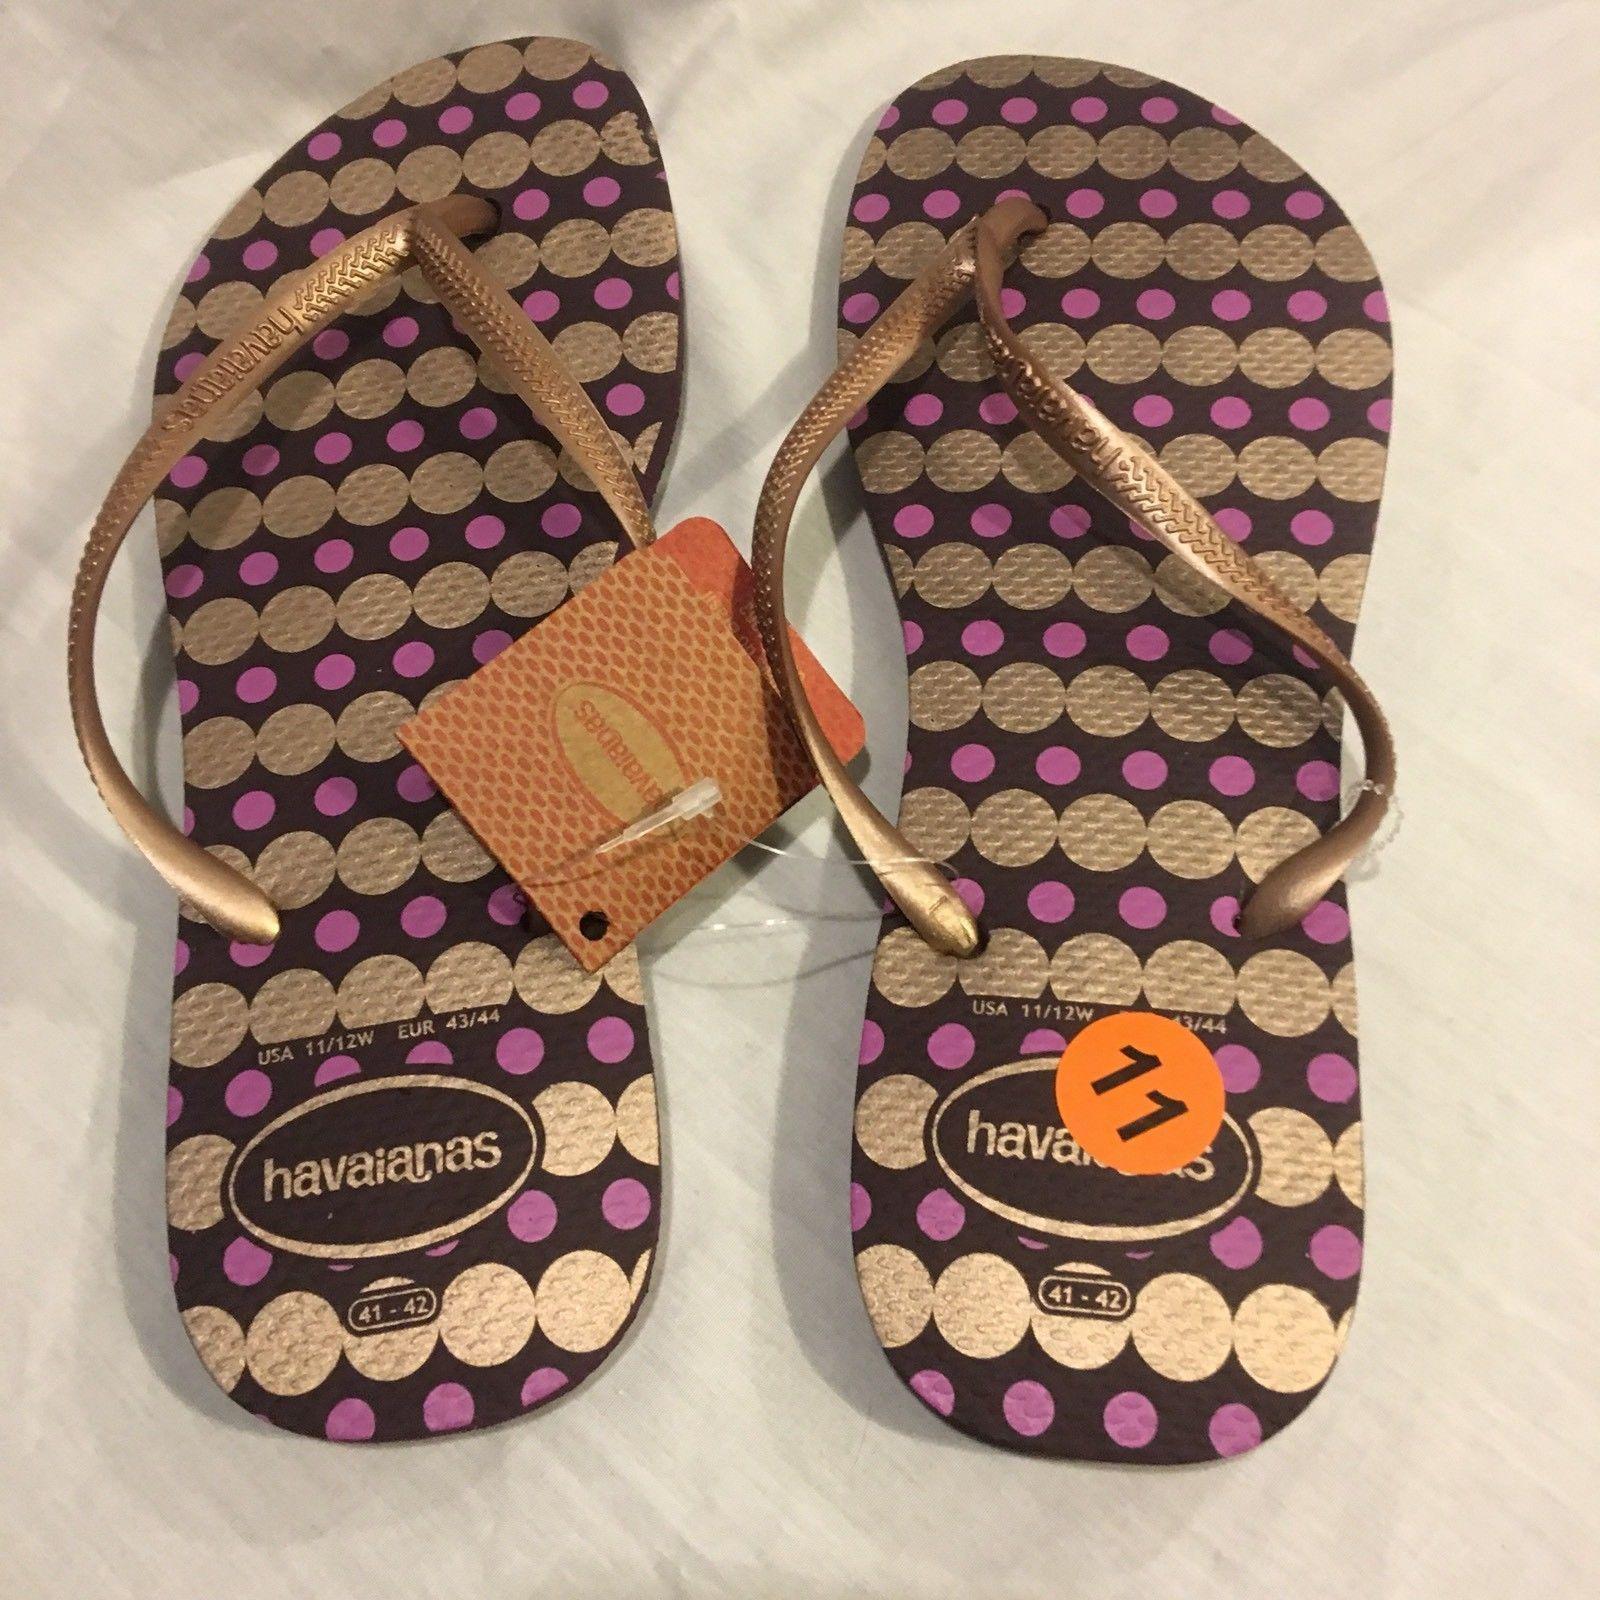 c33e23327032 New Havaianas Slim Women s 11 12 Flip Flops and 46 similar items. S l1600